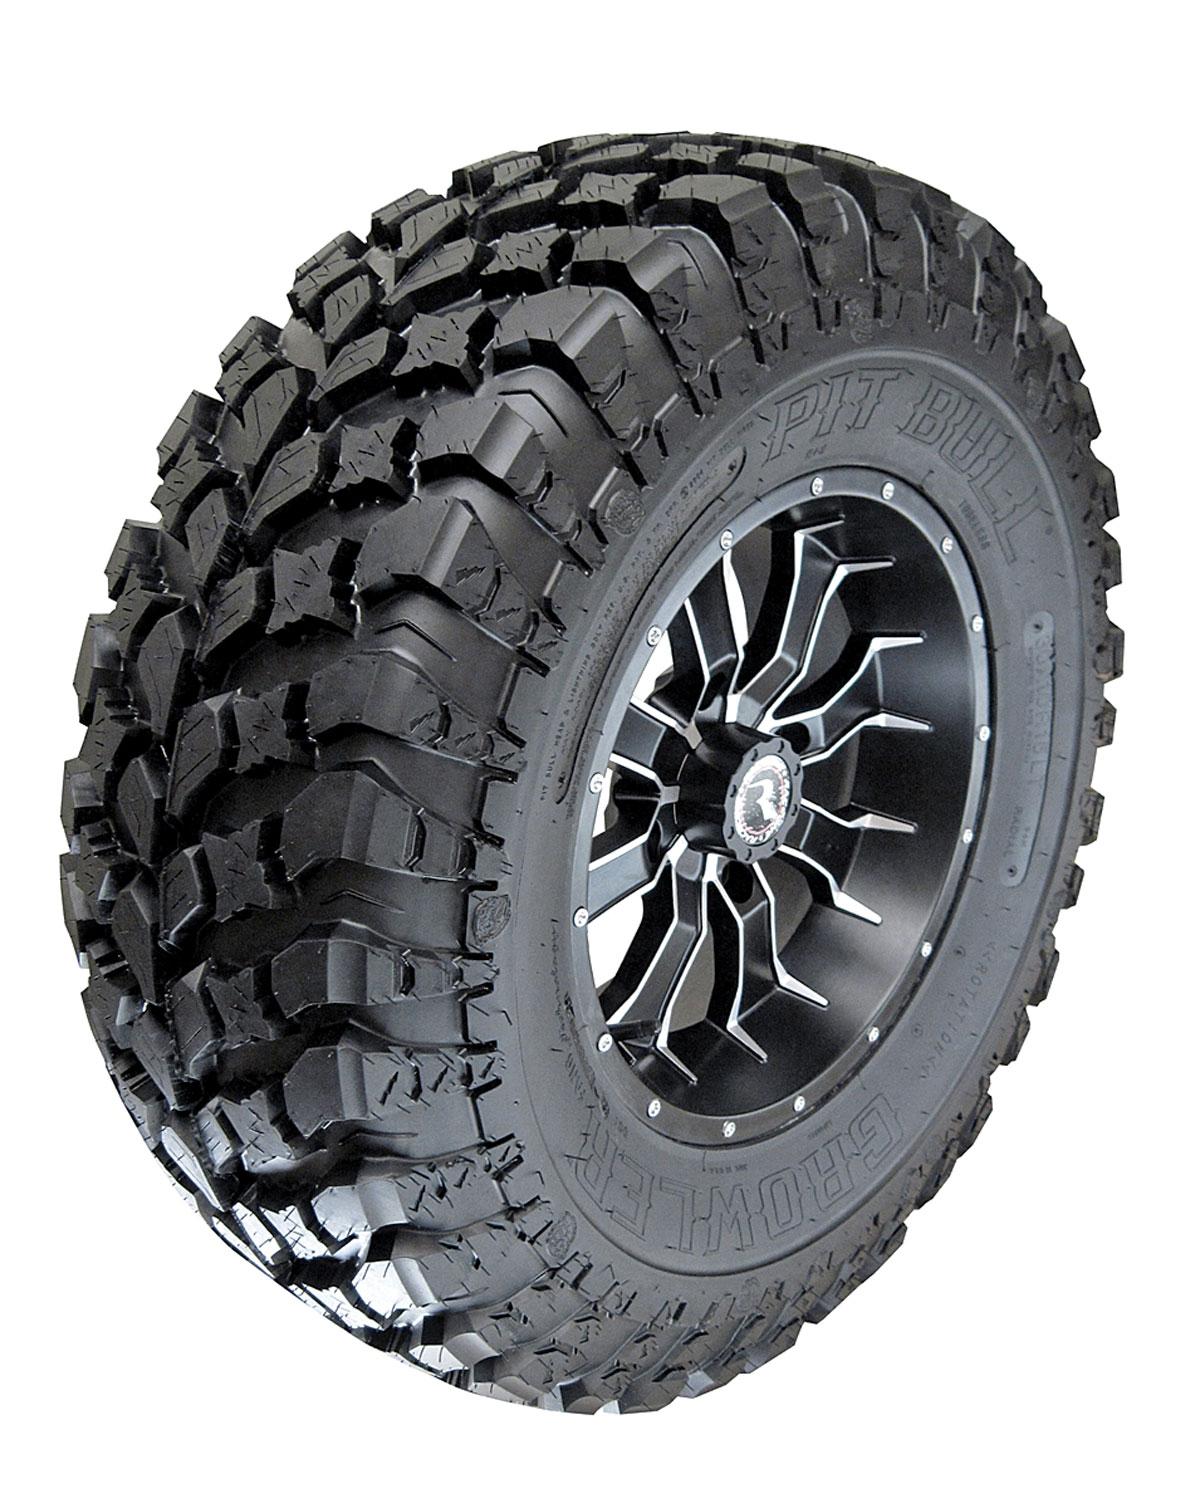 Bighorn atv tires 14